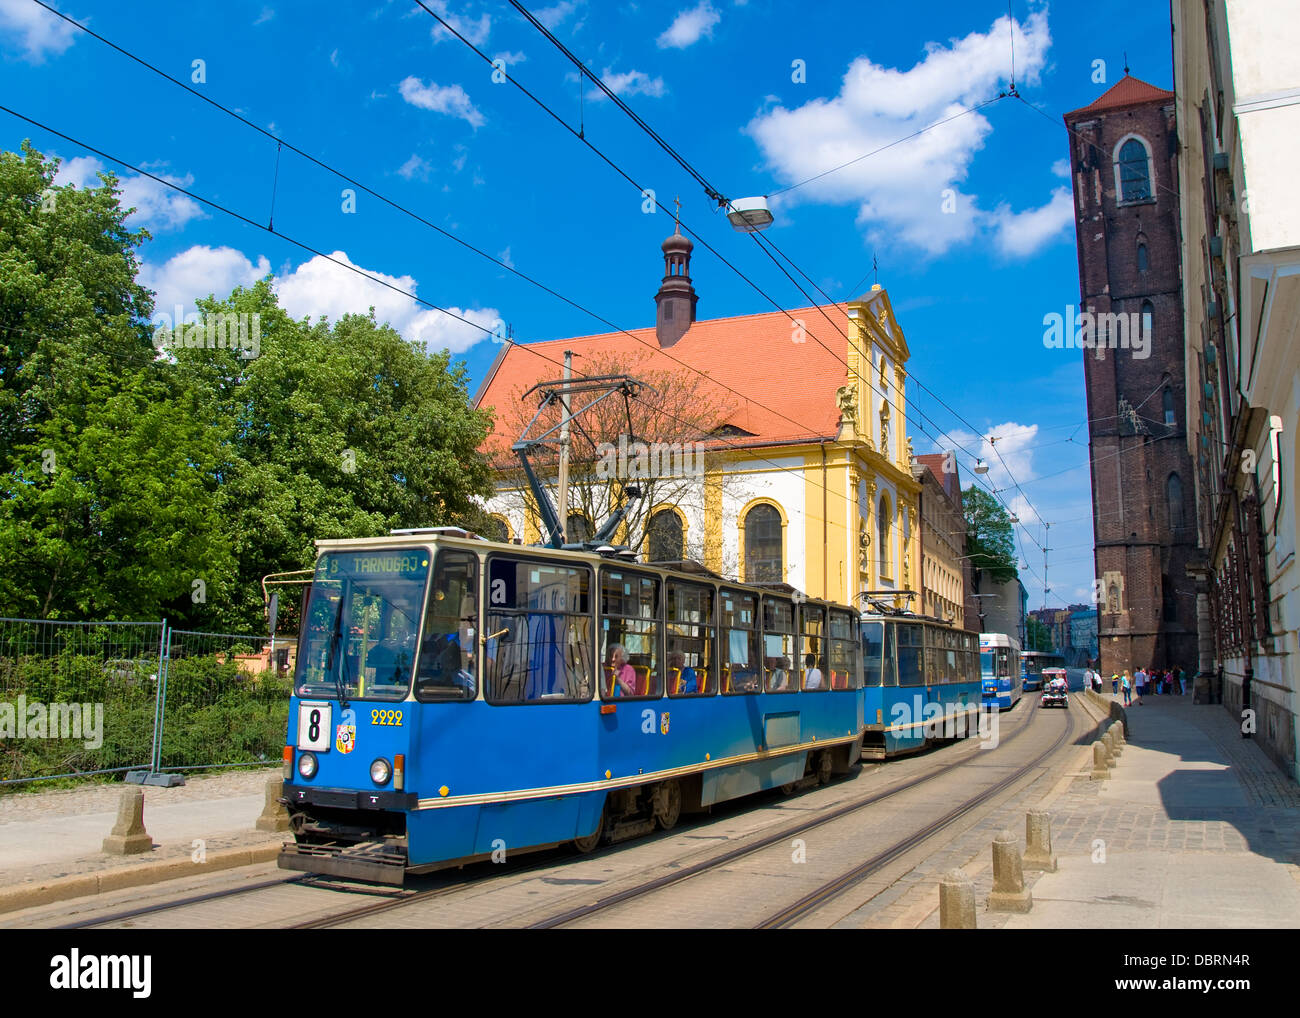 Tram, Wroclaw, Poland - Stock Image